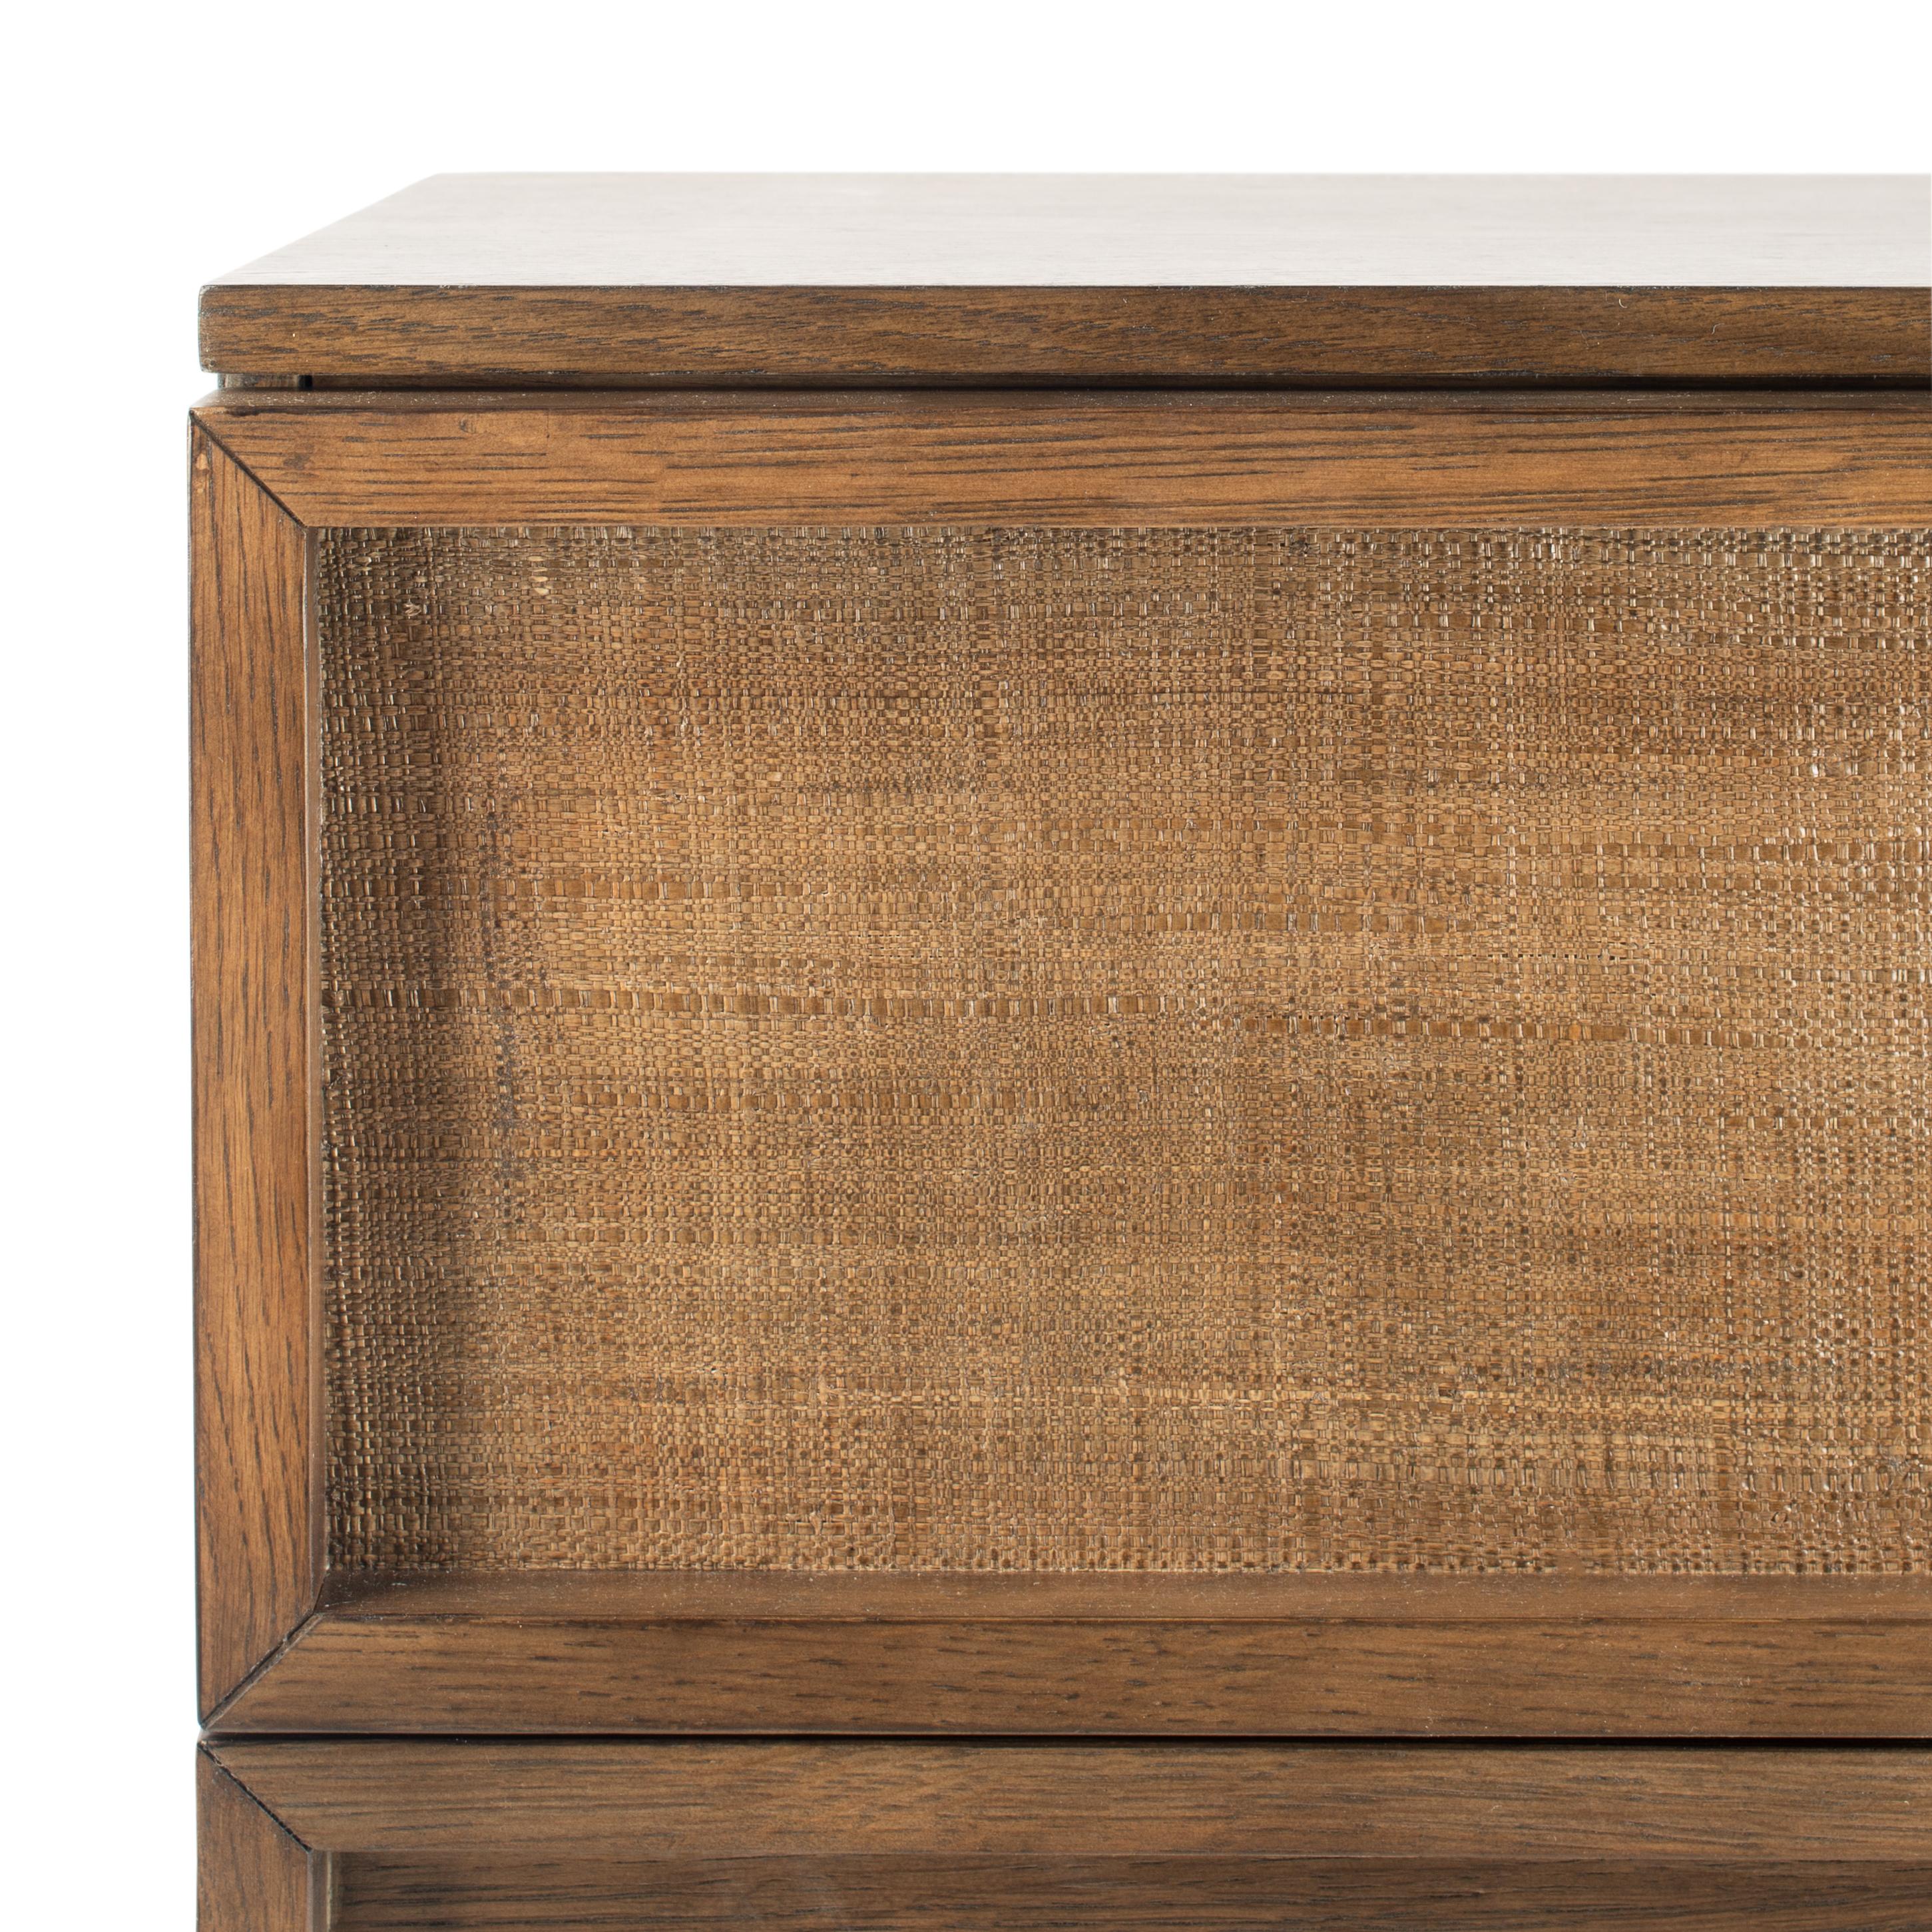 Zeus 6 Drawer Wood Dresser - Natural - Arlo Home